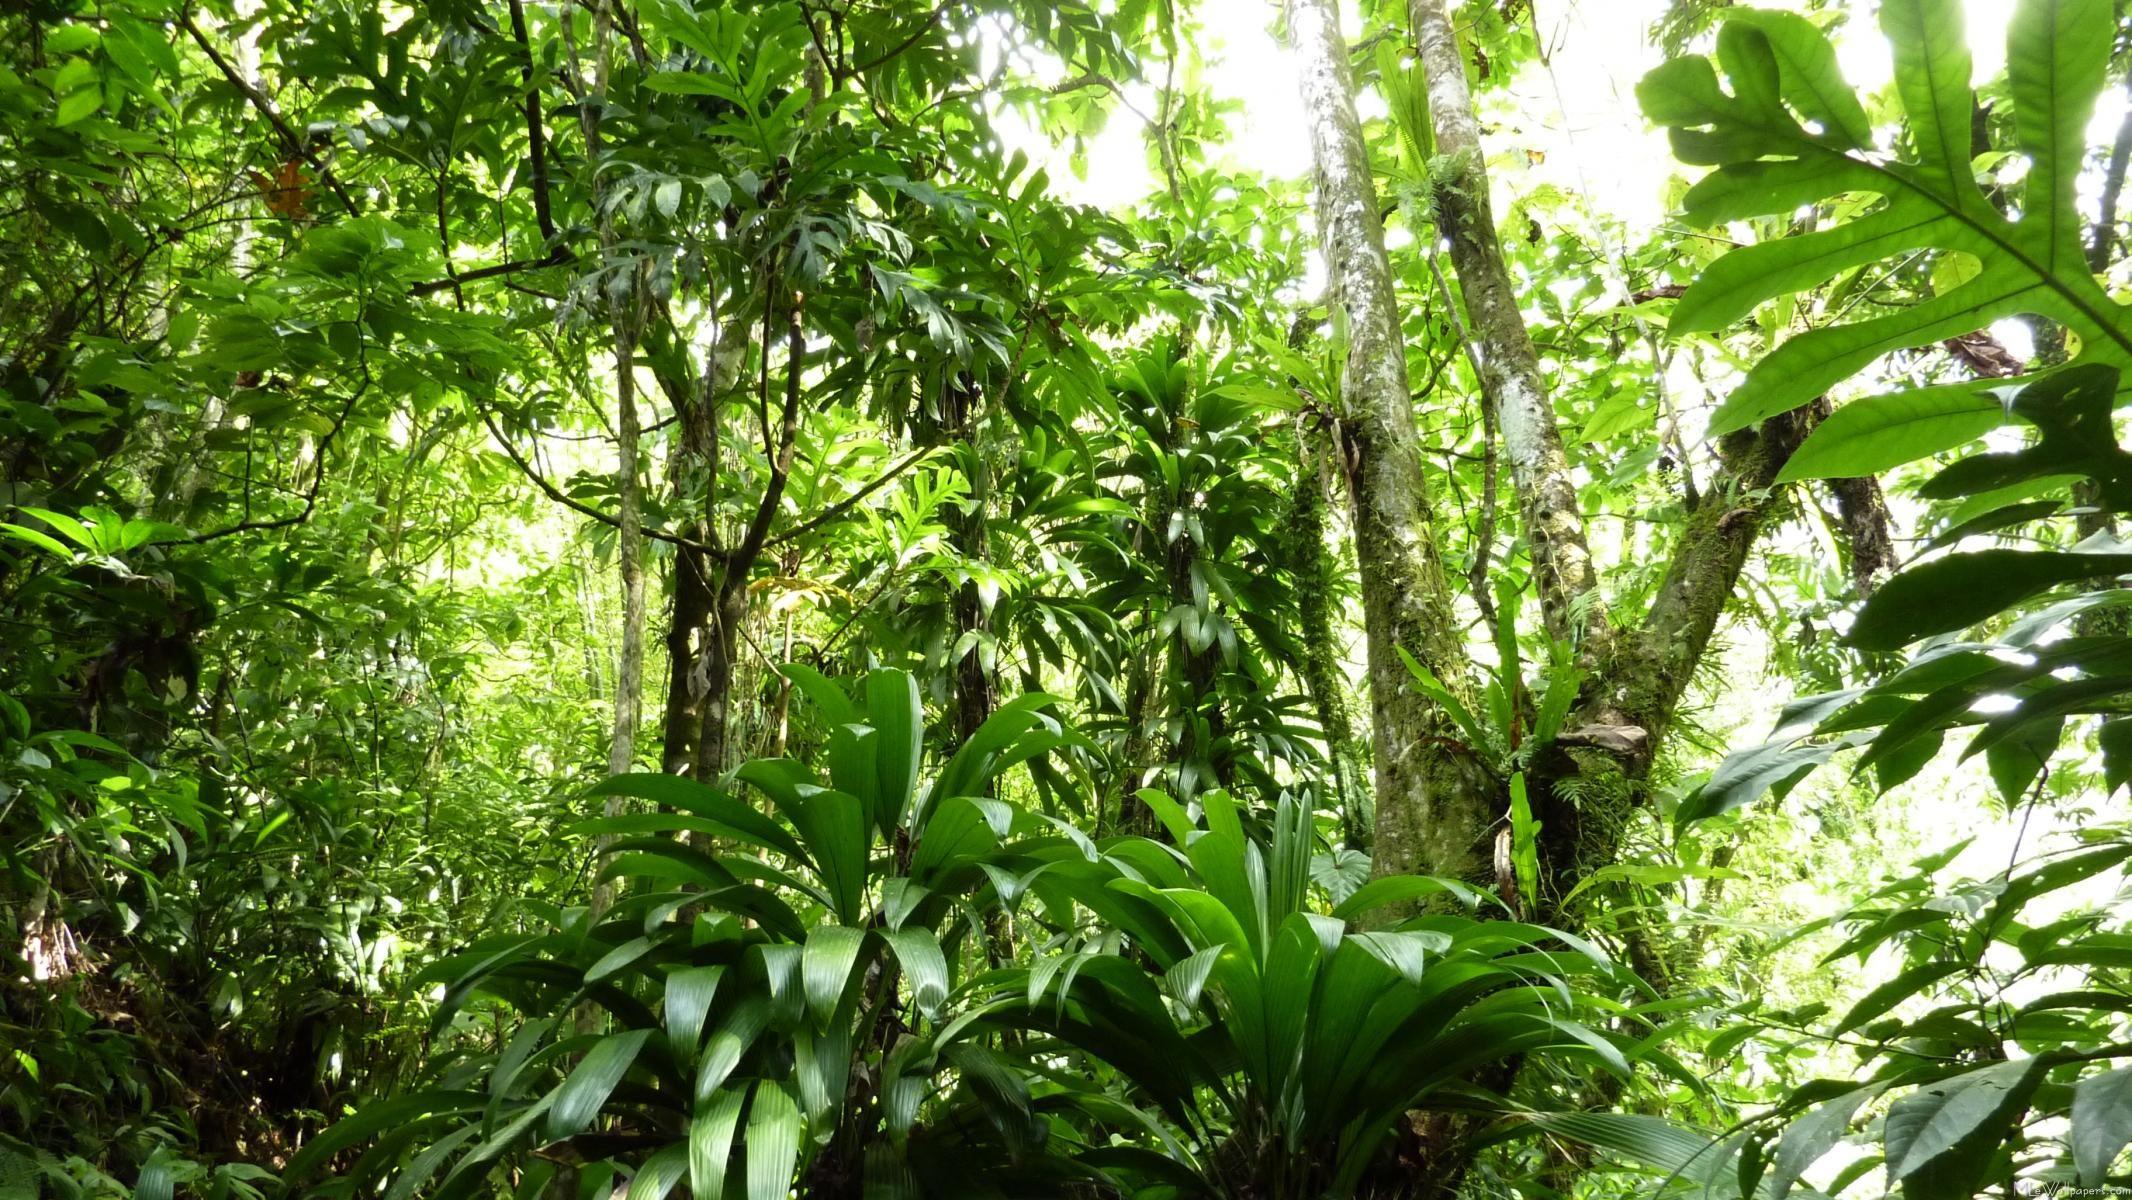 Jungle Wallpaper 1680x1050 Tropical Wallpapers 49